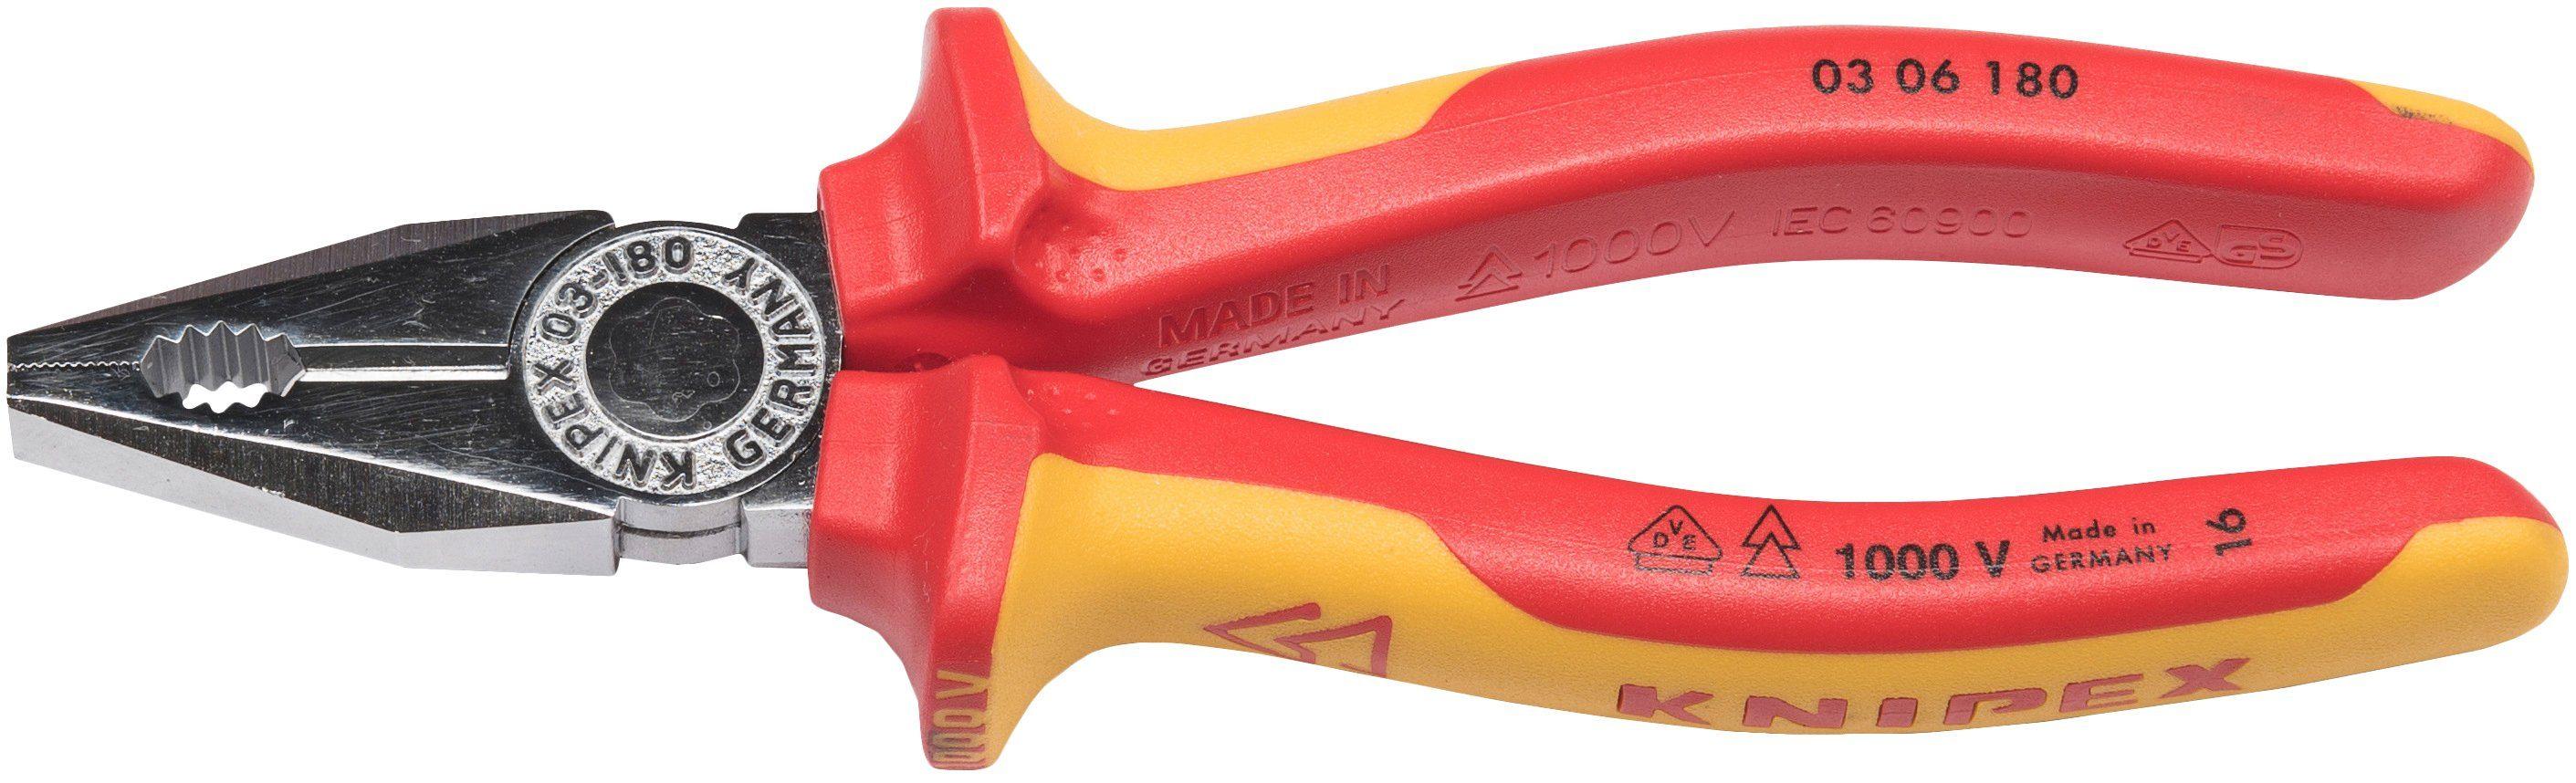 KNIPEX Kombizange »WKPT0306180«, 180 mm